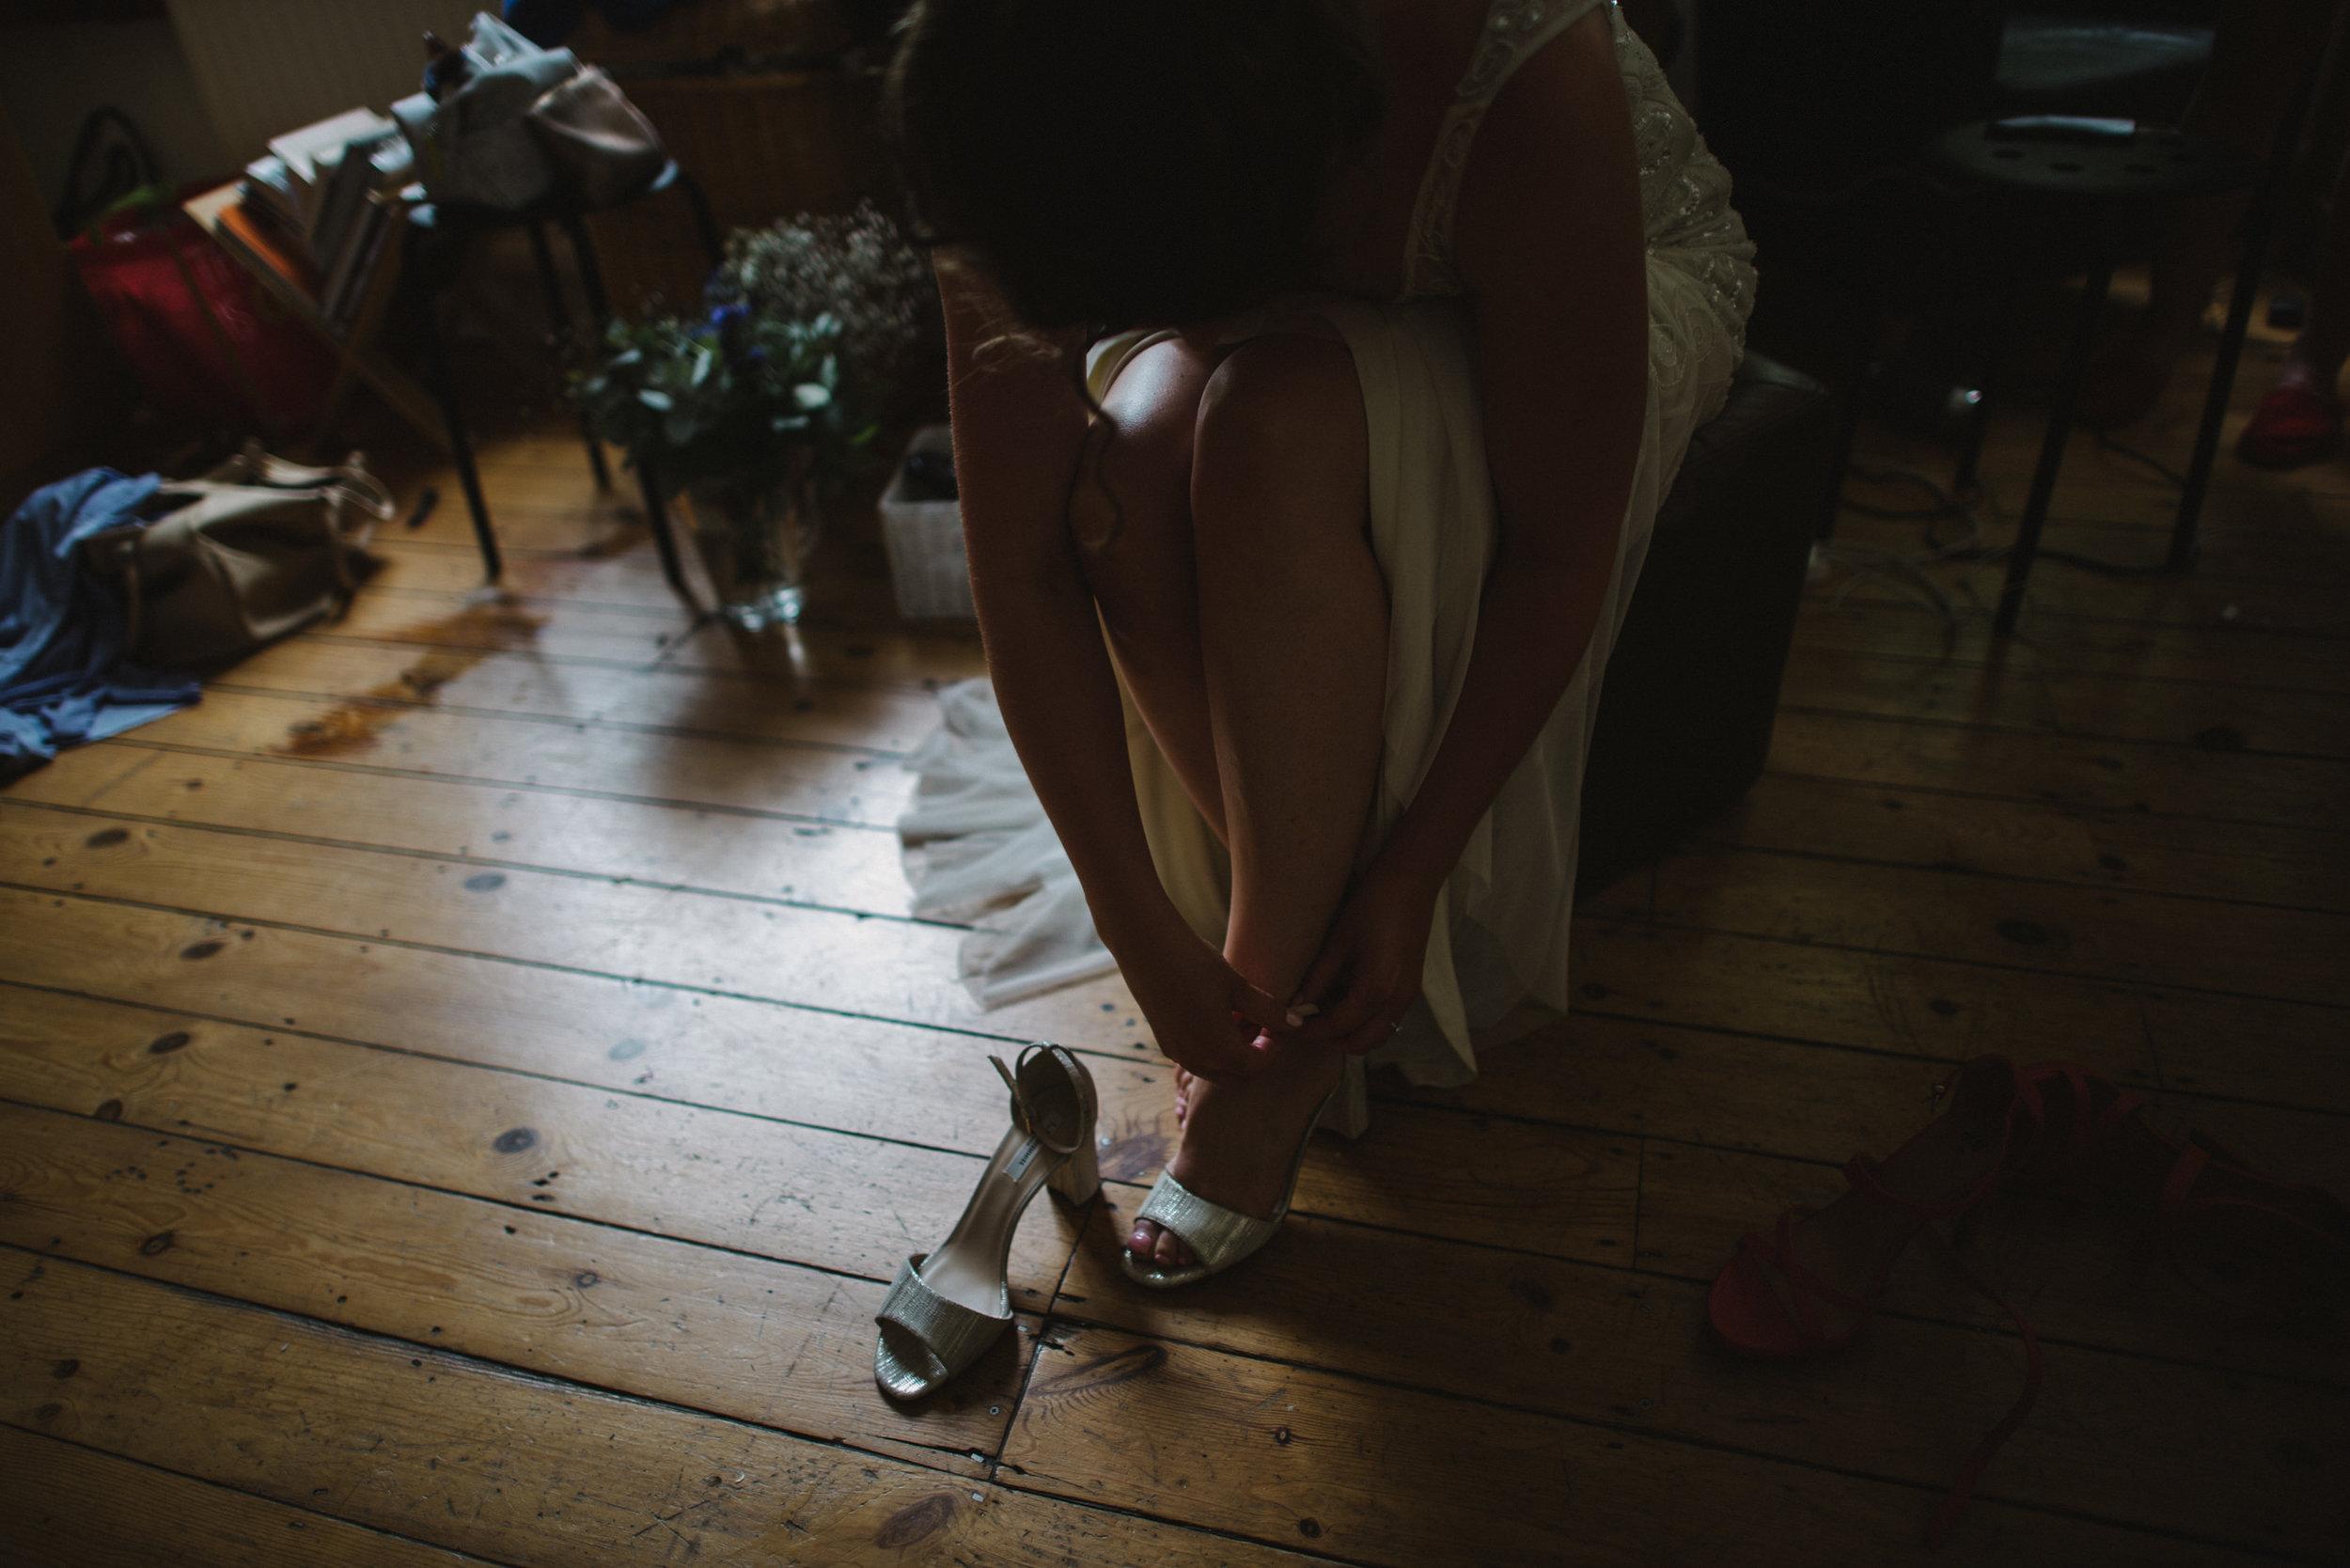 0096-LISA-DEVINE-PHOTOGRAPHY-ALTERNATIVE-WEDDING-PHOTOGRAPHY-SCOTLAND-DESTINATION-WEDDINGS-GLASGOW-WEDDINGS-COOL-WEDDINGS-STYLISH-WEDDINGS.JPG